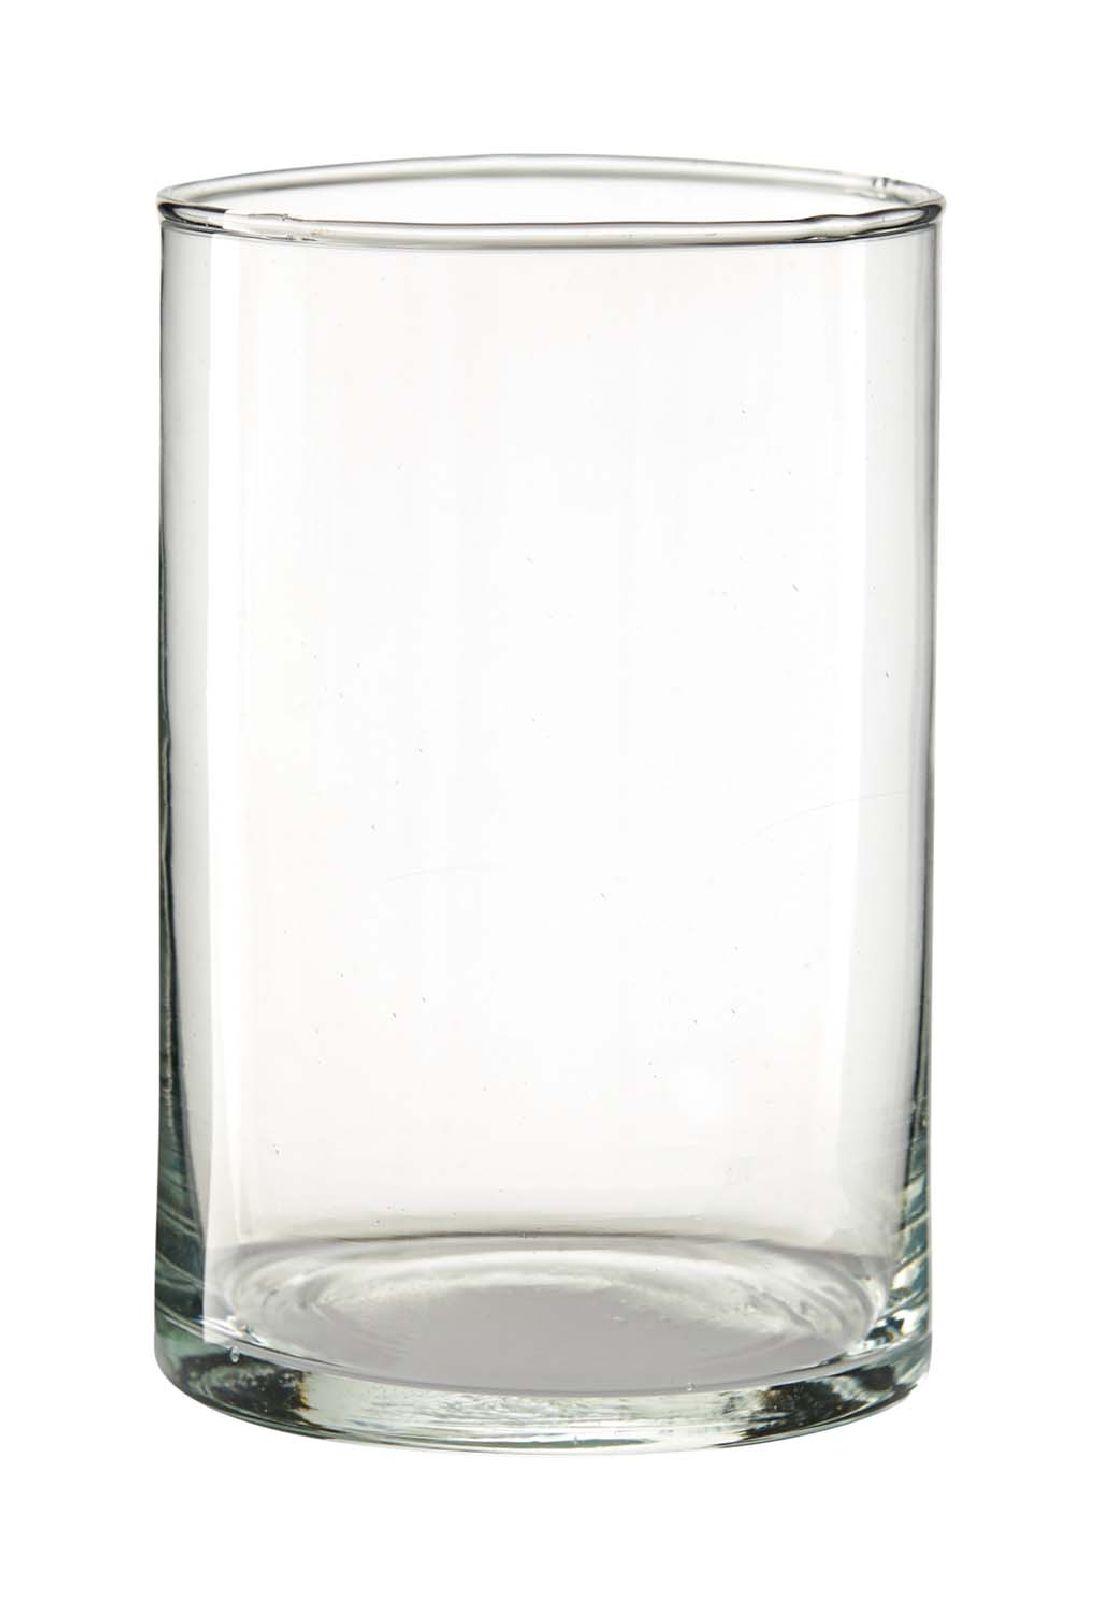 Zylinder Glas press KLAR 1850/40 Ø10cm x H40cm